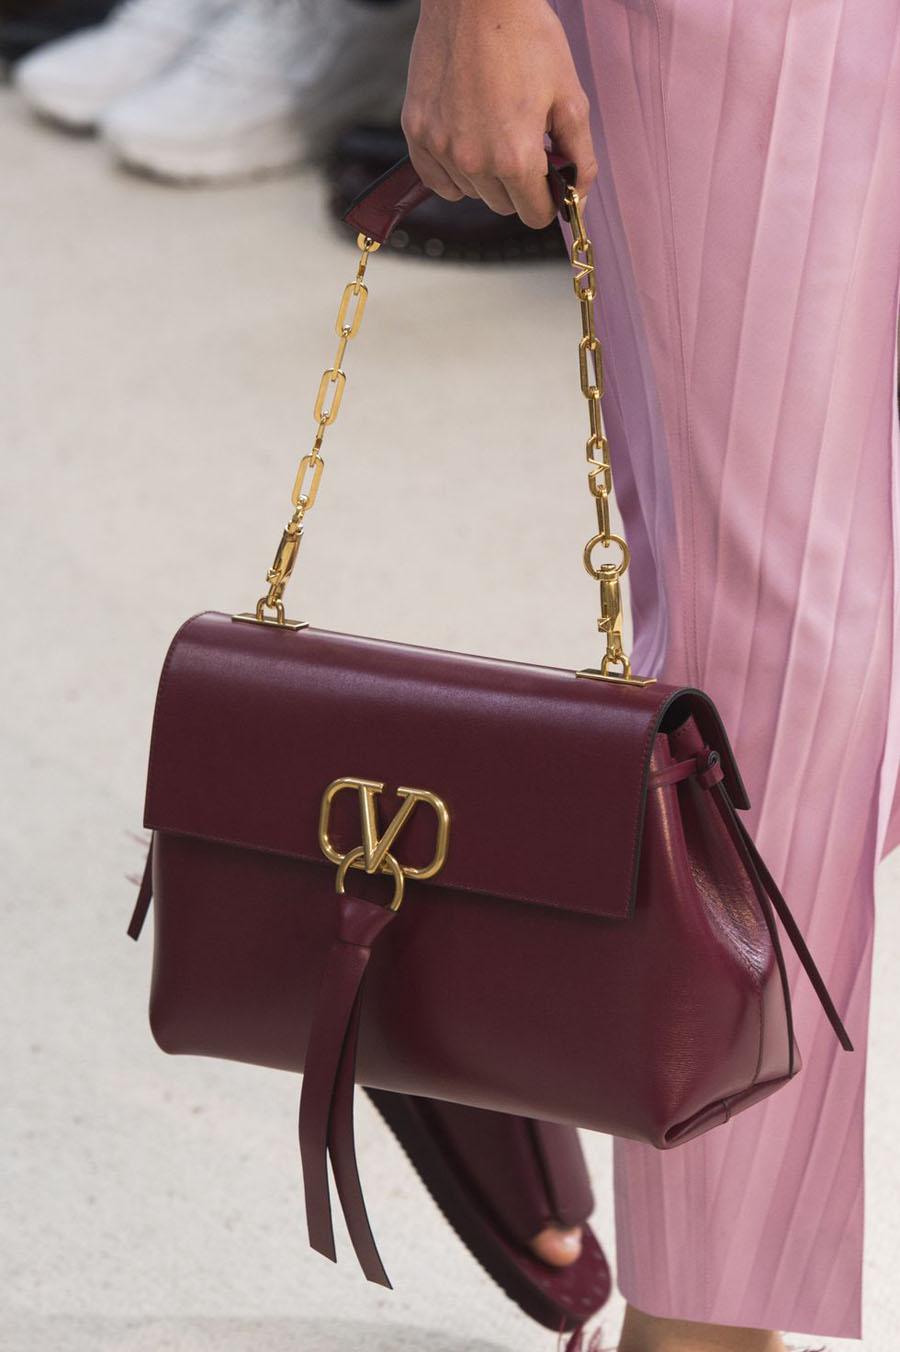 valentino-bag-s19-024-1538654679